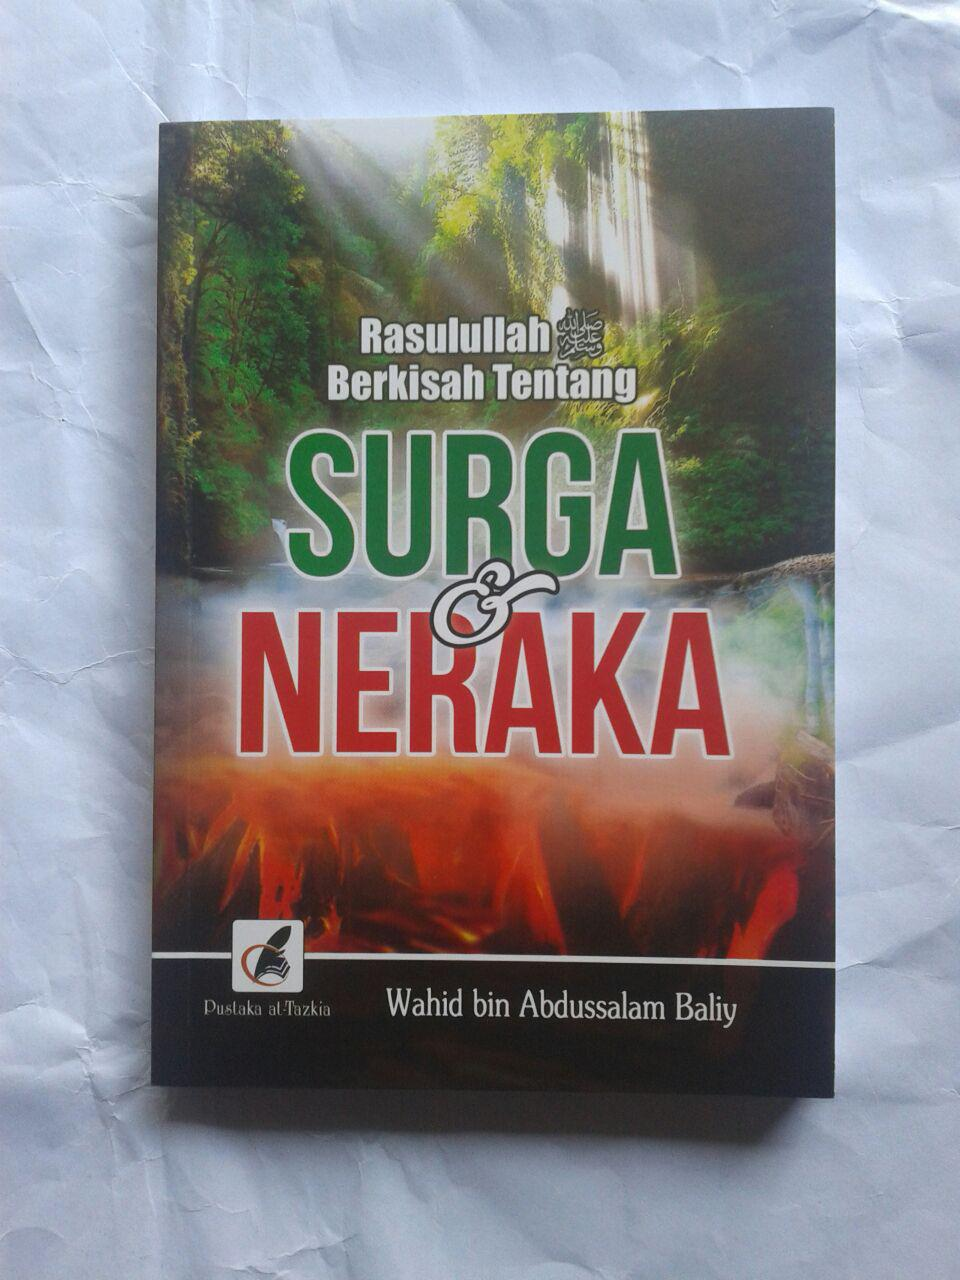 Buku Rasulullah Berkisah Tentang Surga & Neraka 25,000 15% 21,250 cover 2